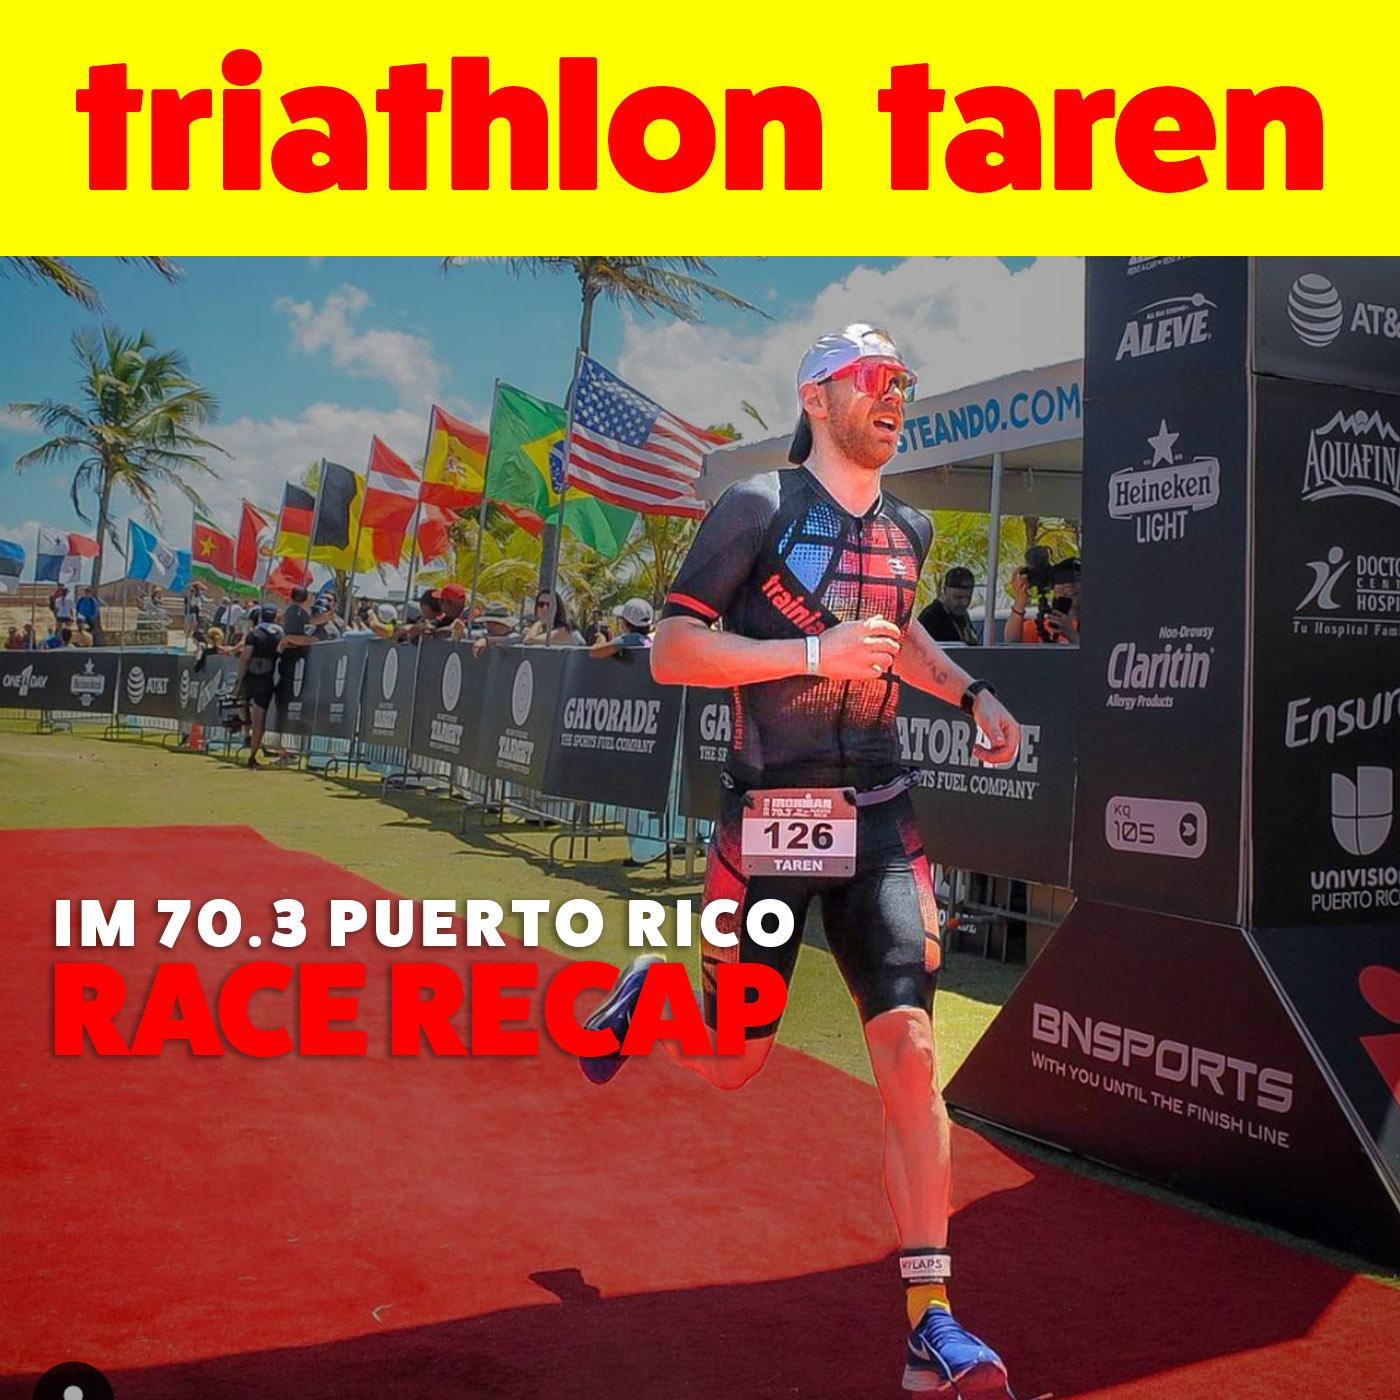 Ironman 70.3 Puerto Rico Race Recap